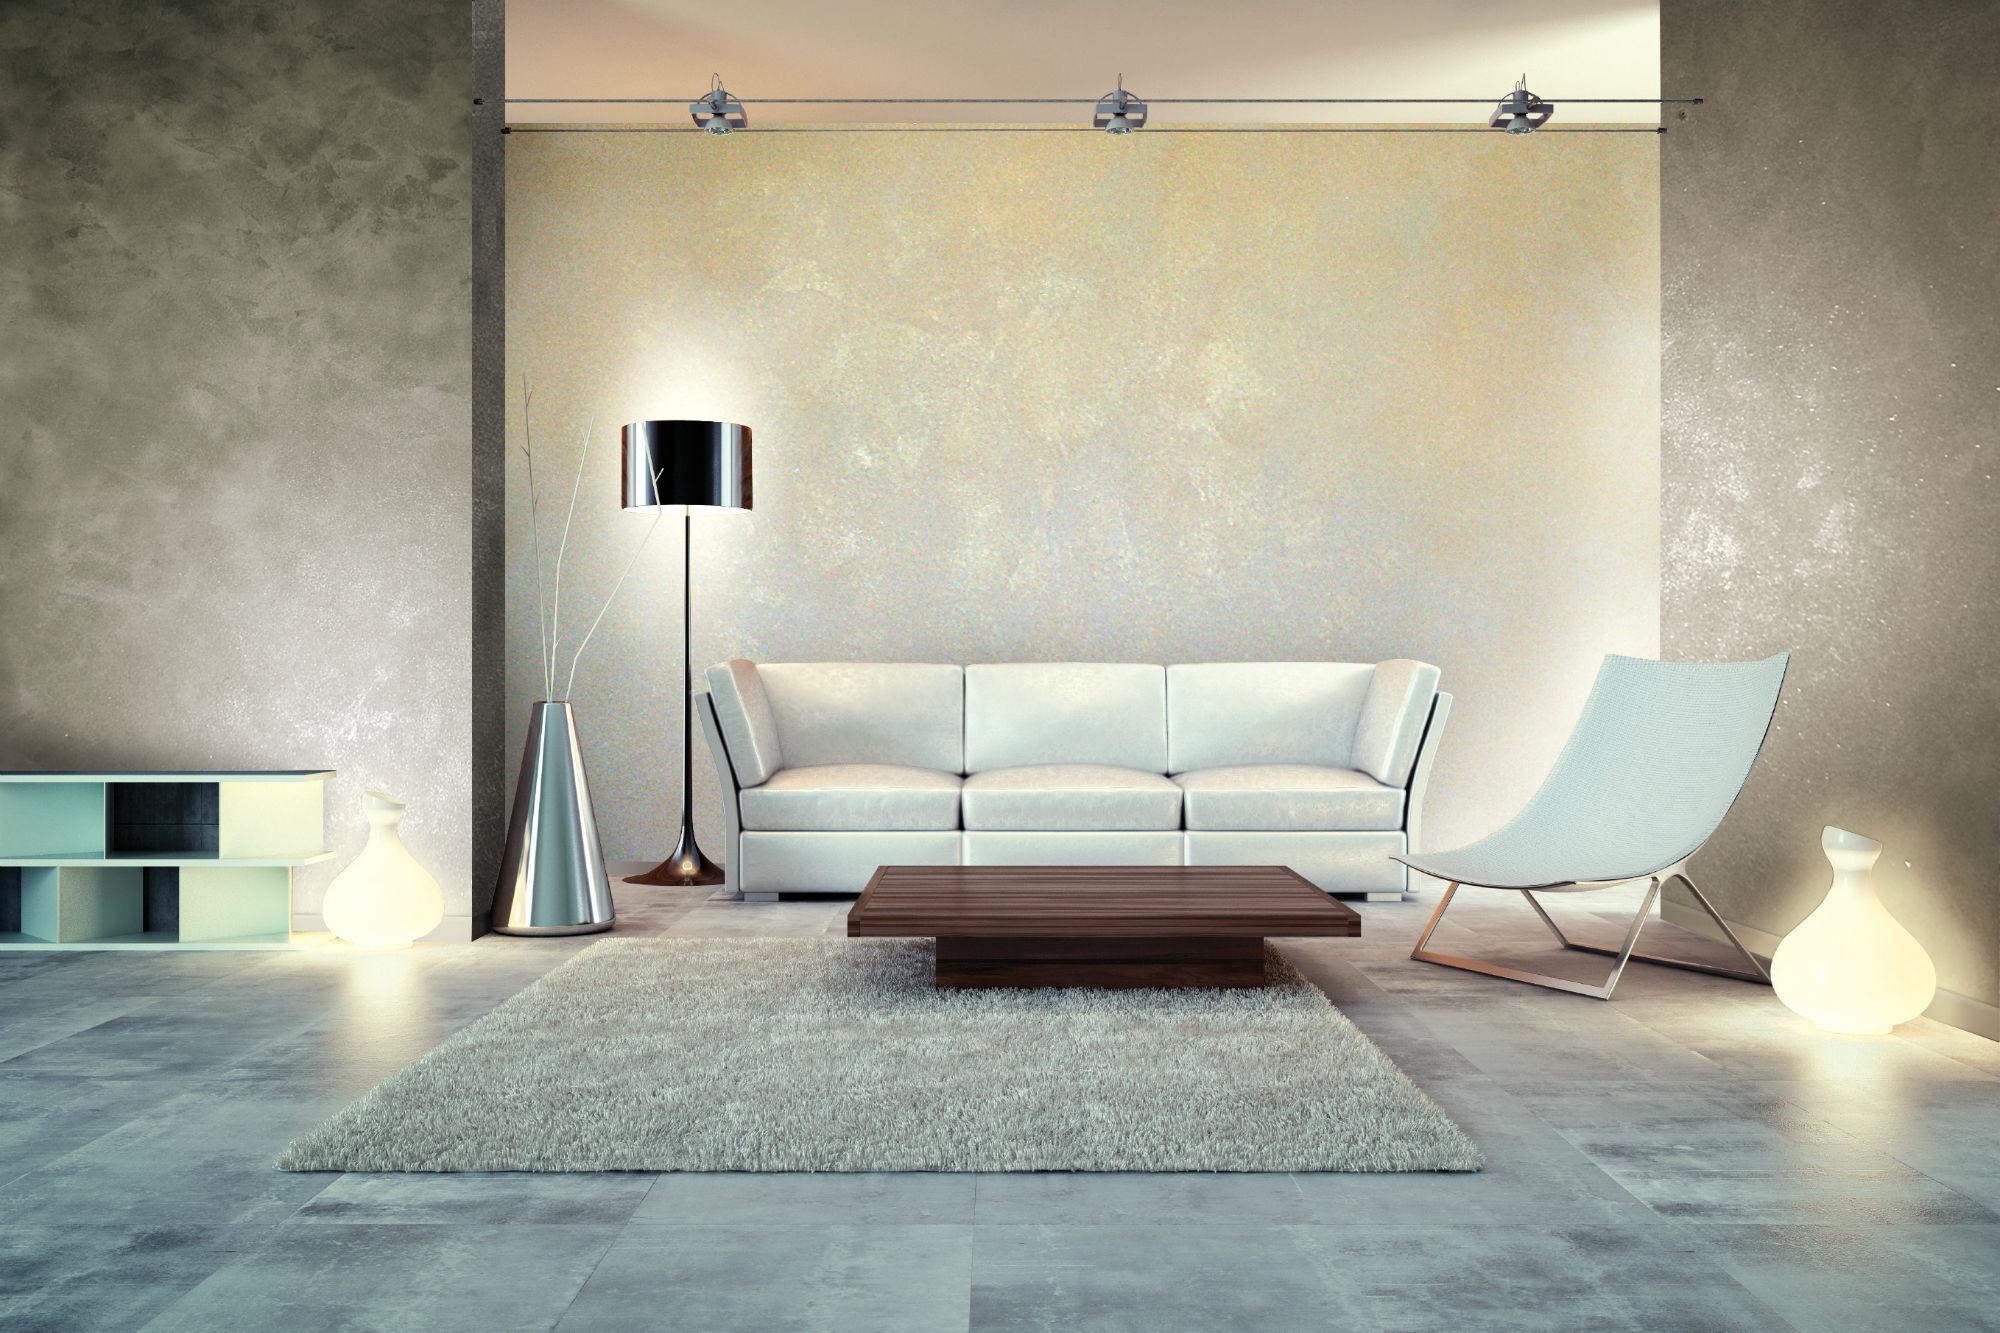 Pittura moderna soggiorno ~ avienix.com for .